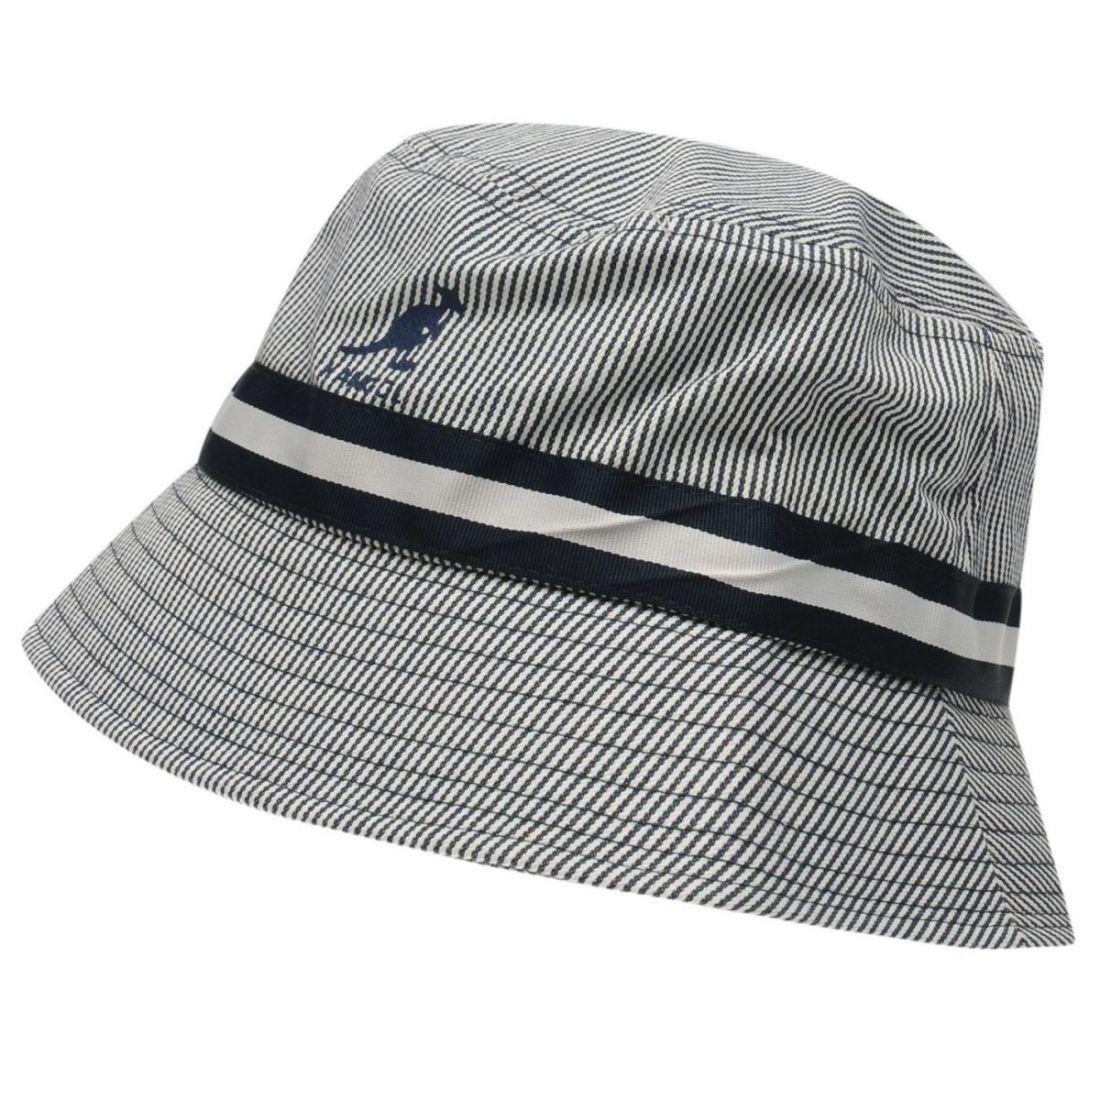 1094f826fcc1b Details about Kangol Mens Stripe Bucket Hat Lightweight